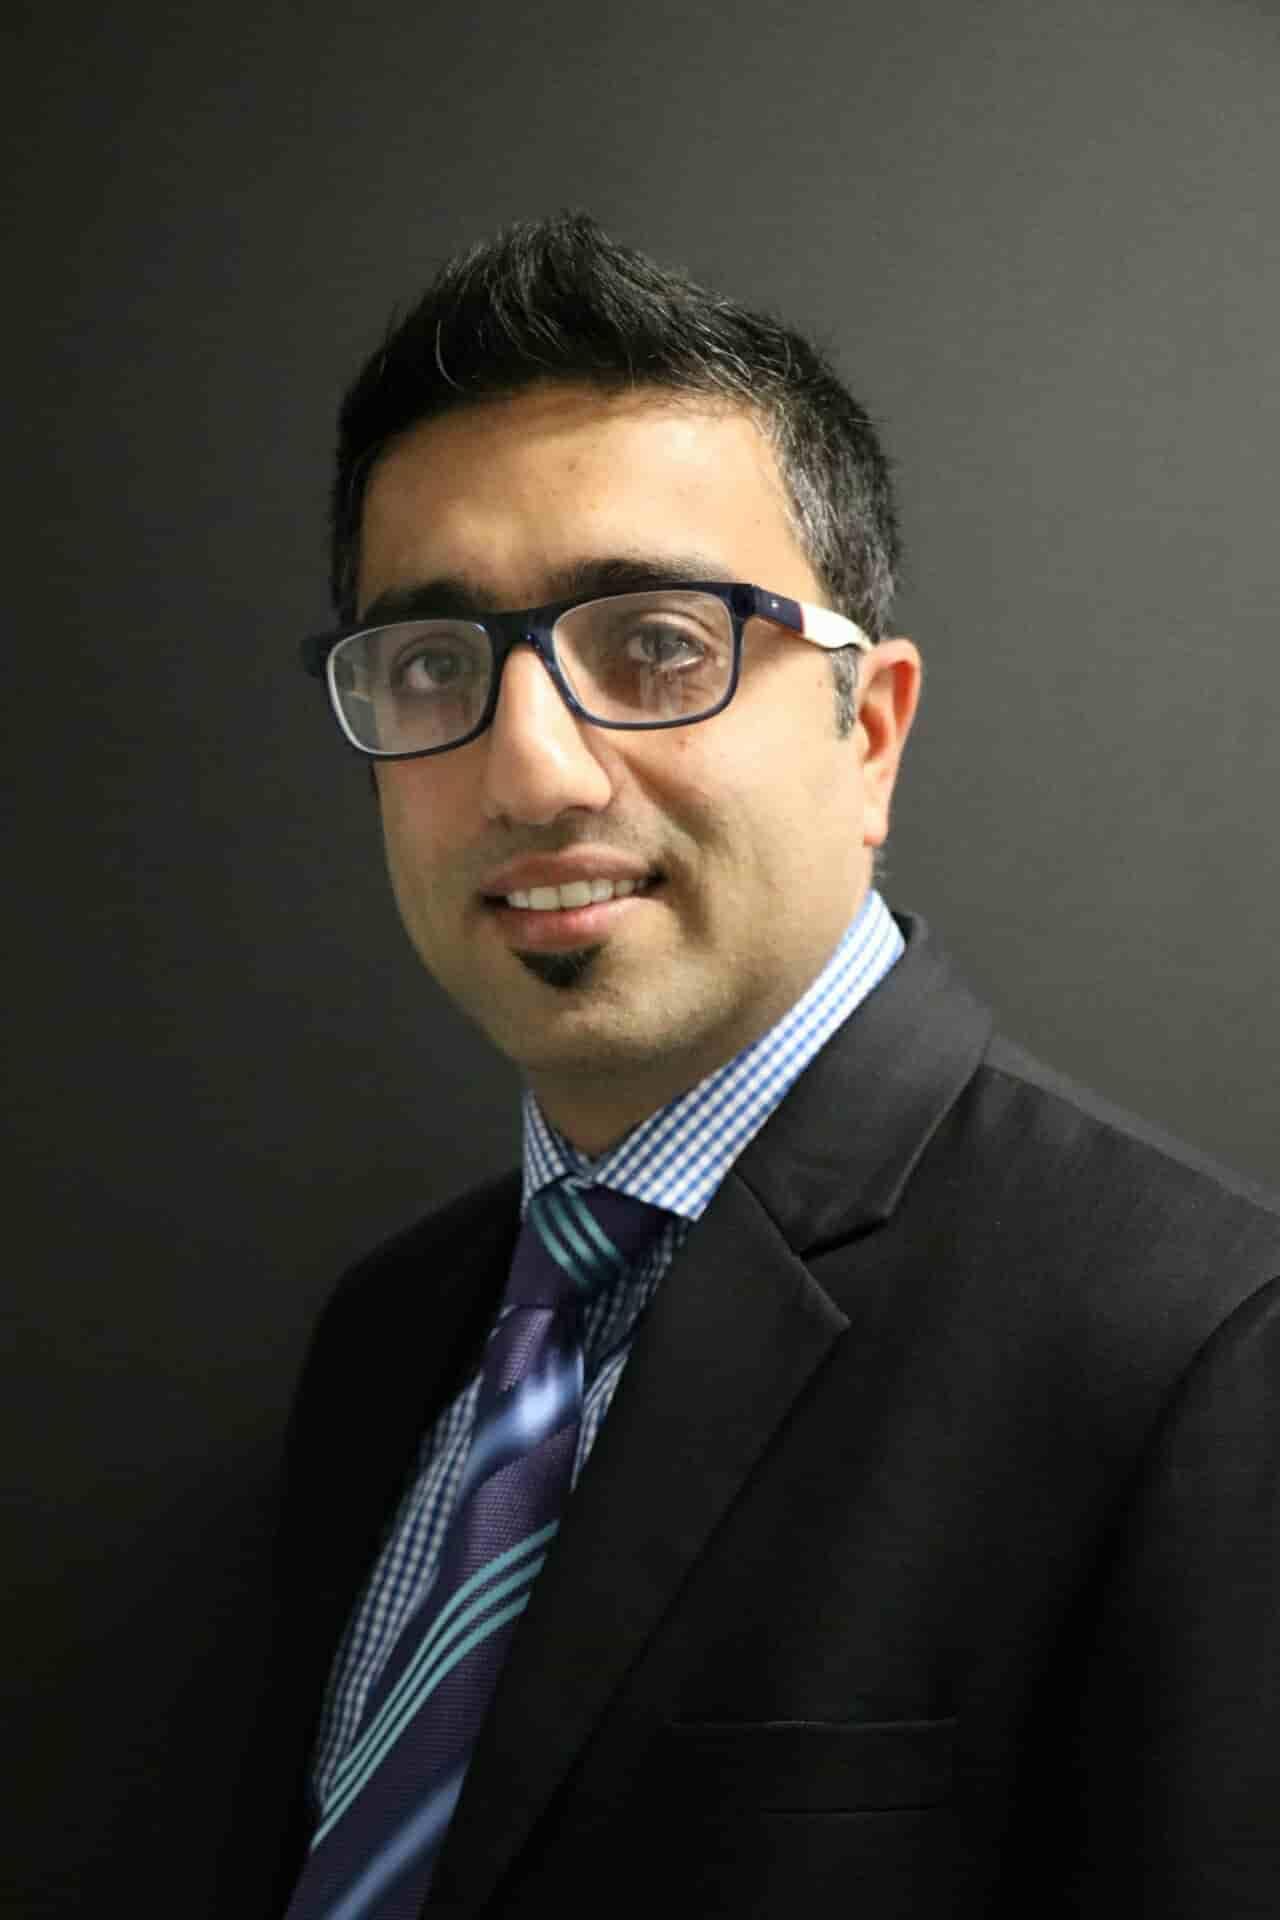 Manish Gaind Hotspotcentral investor